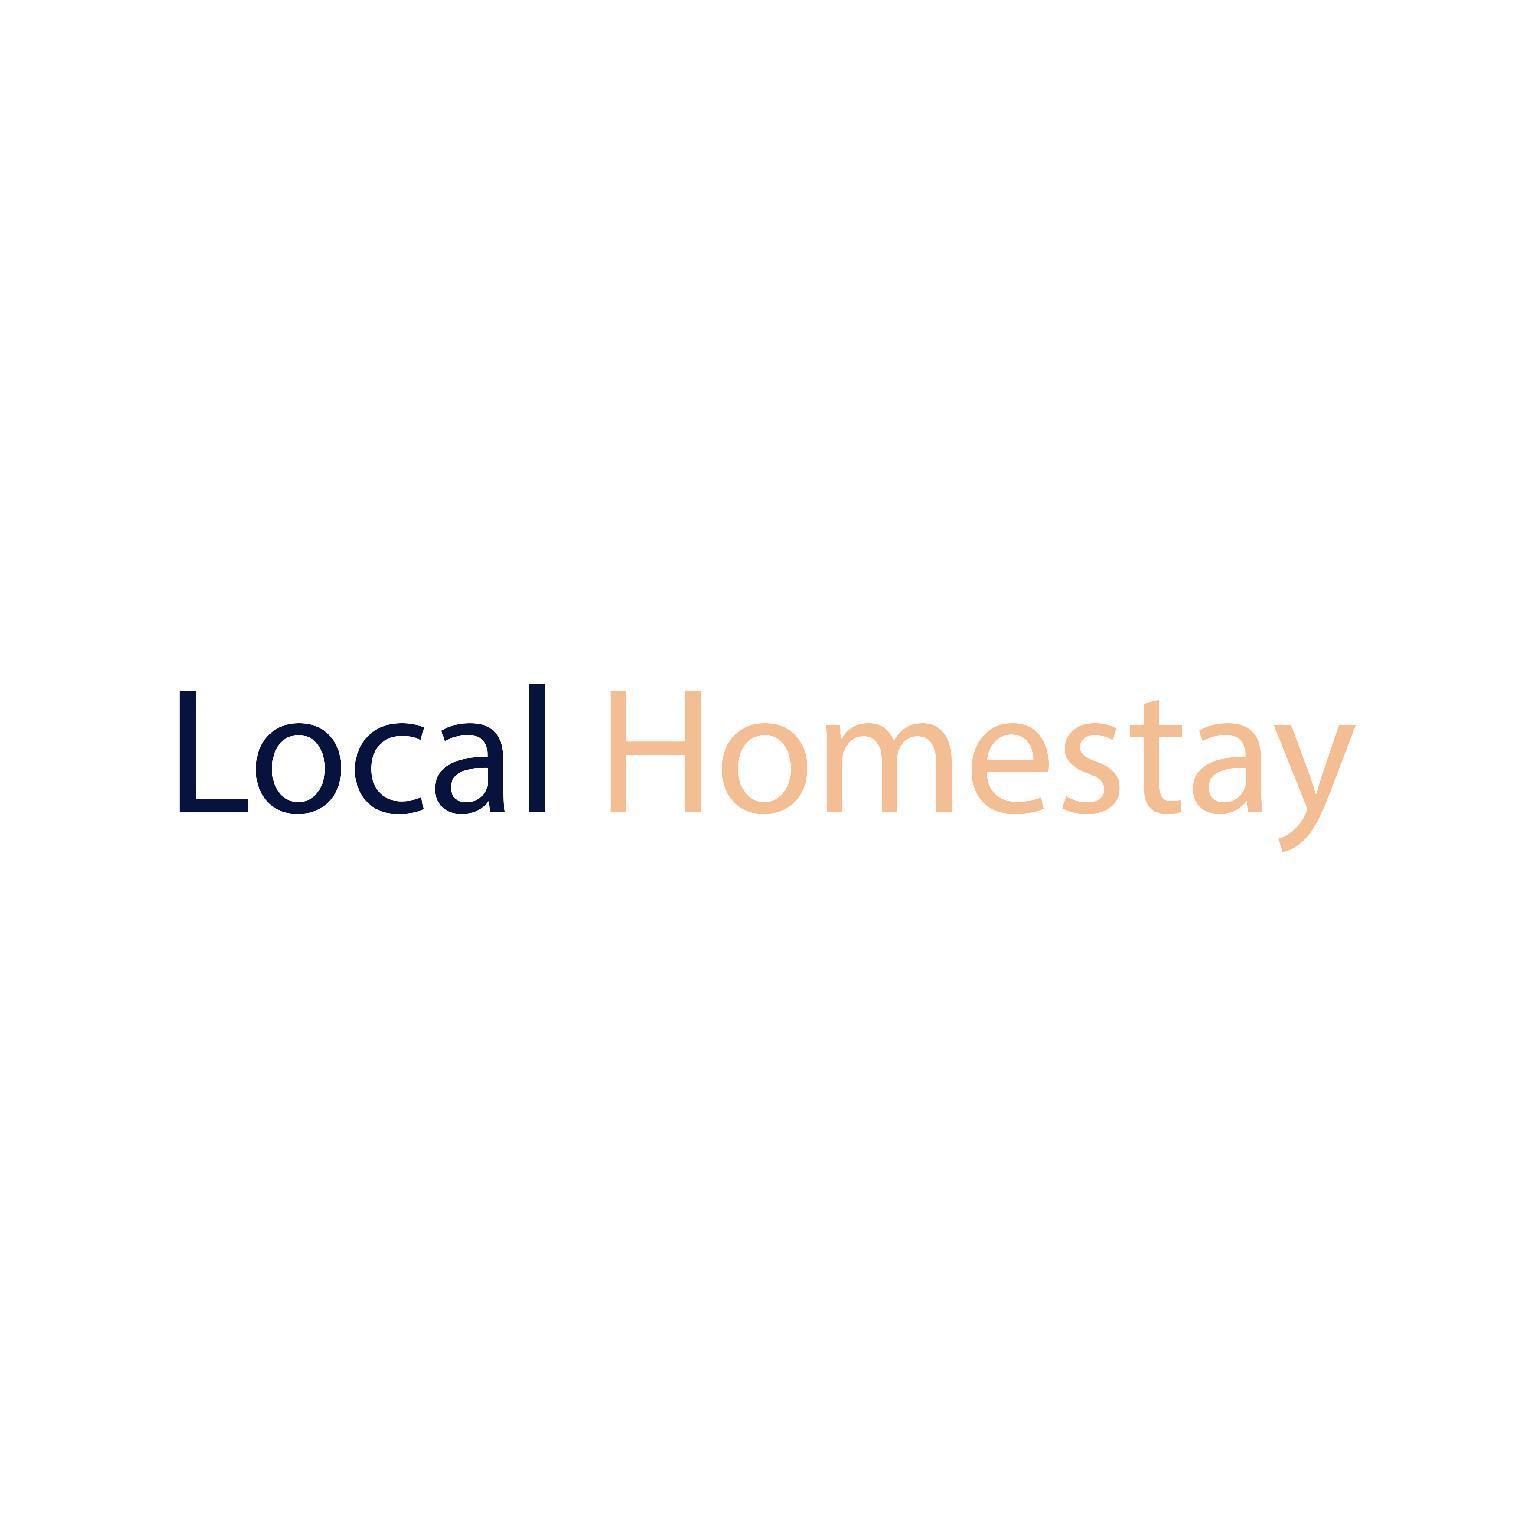 Local Homestay